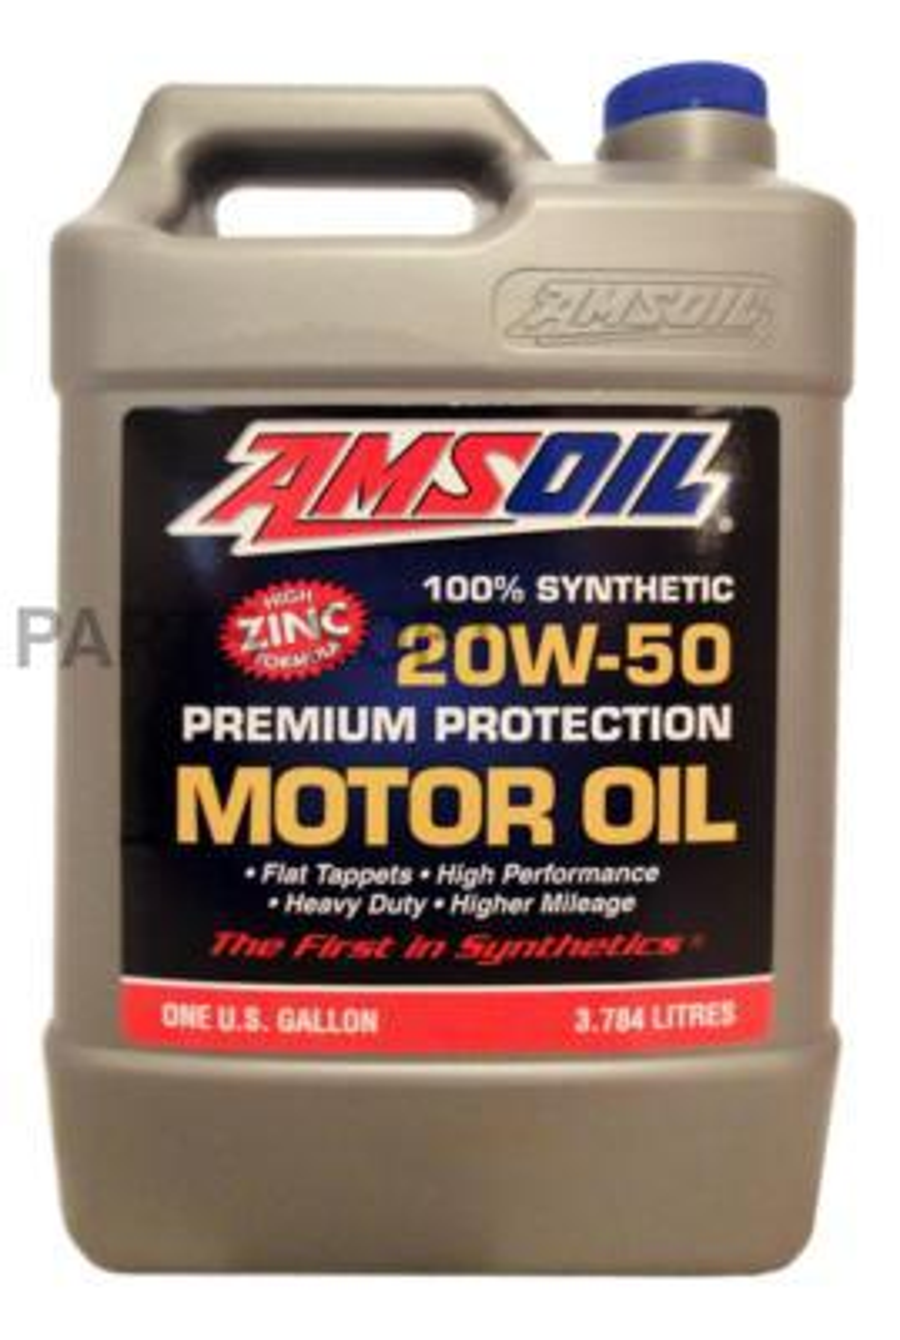 Масло моторное синтетическое Synthetic Premium Protection Motor Oil 20W-50, 3,784л